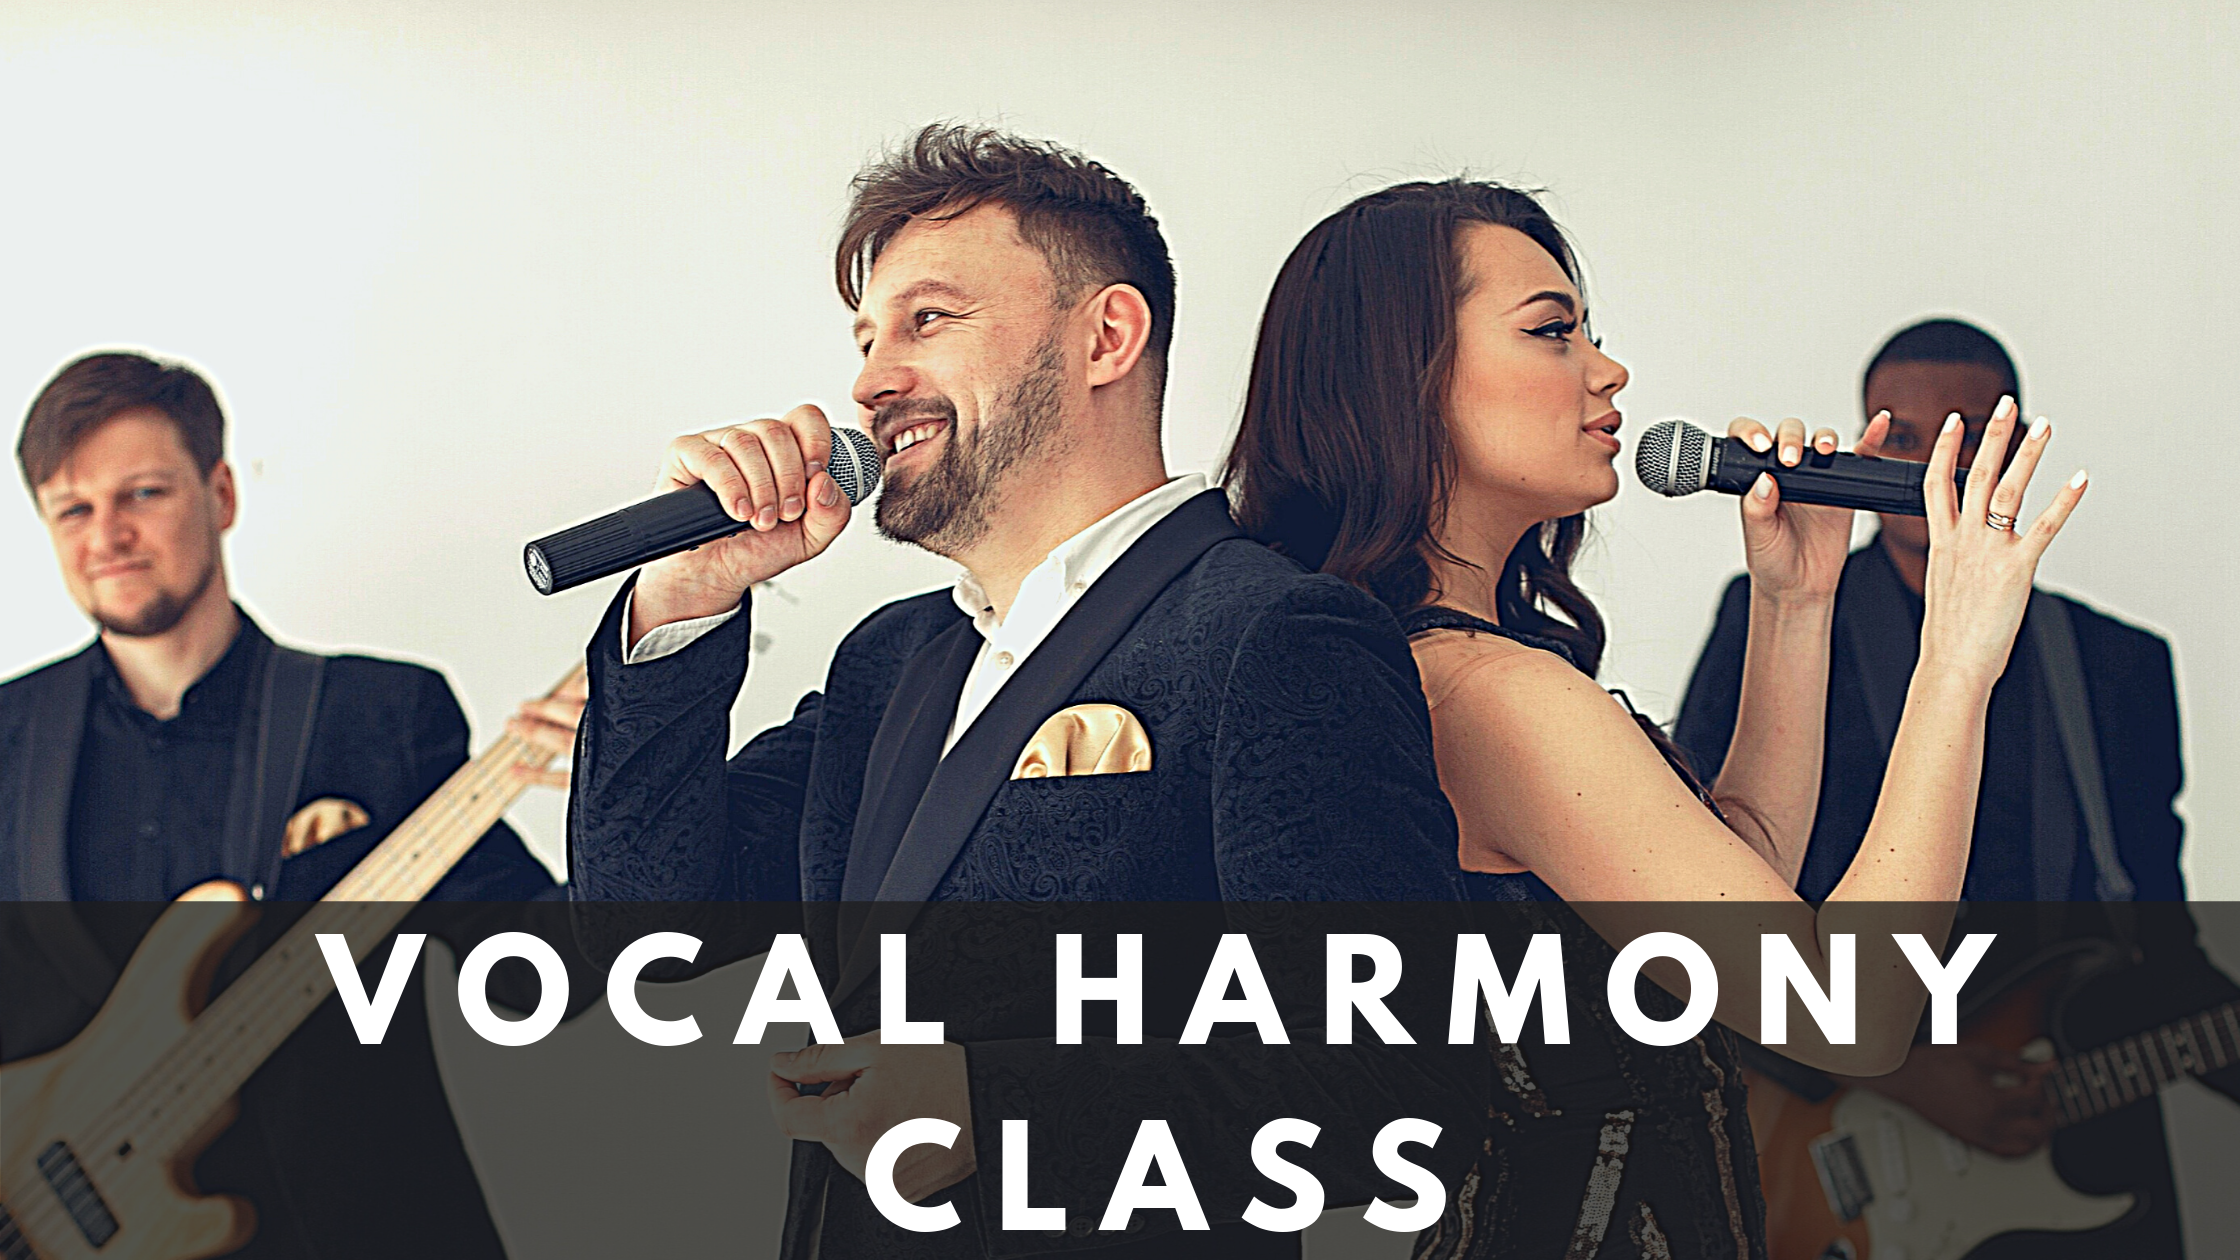 Copy of Vocal Harmony Class